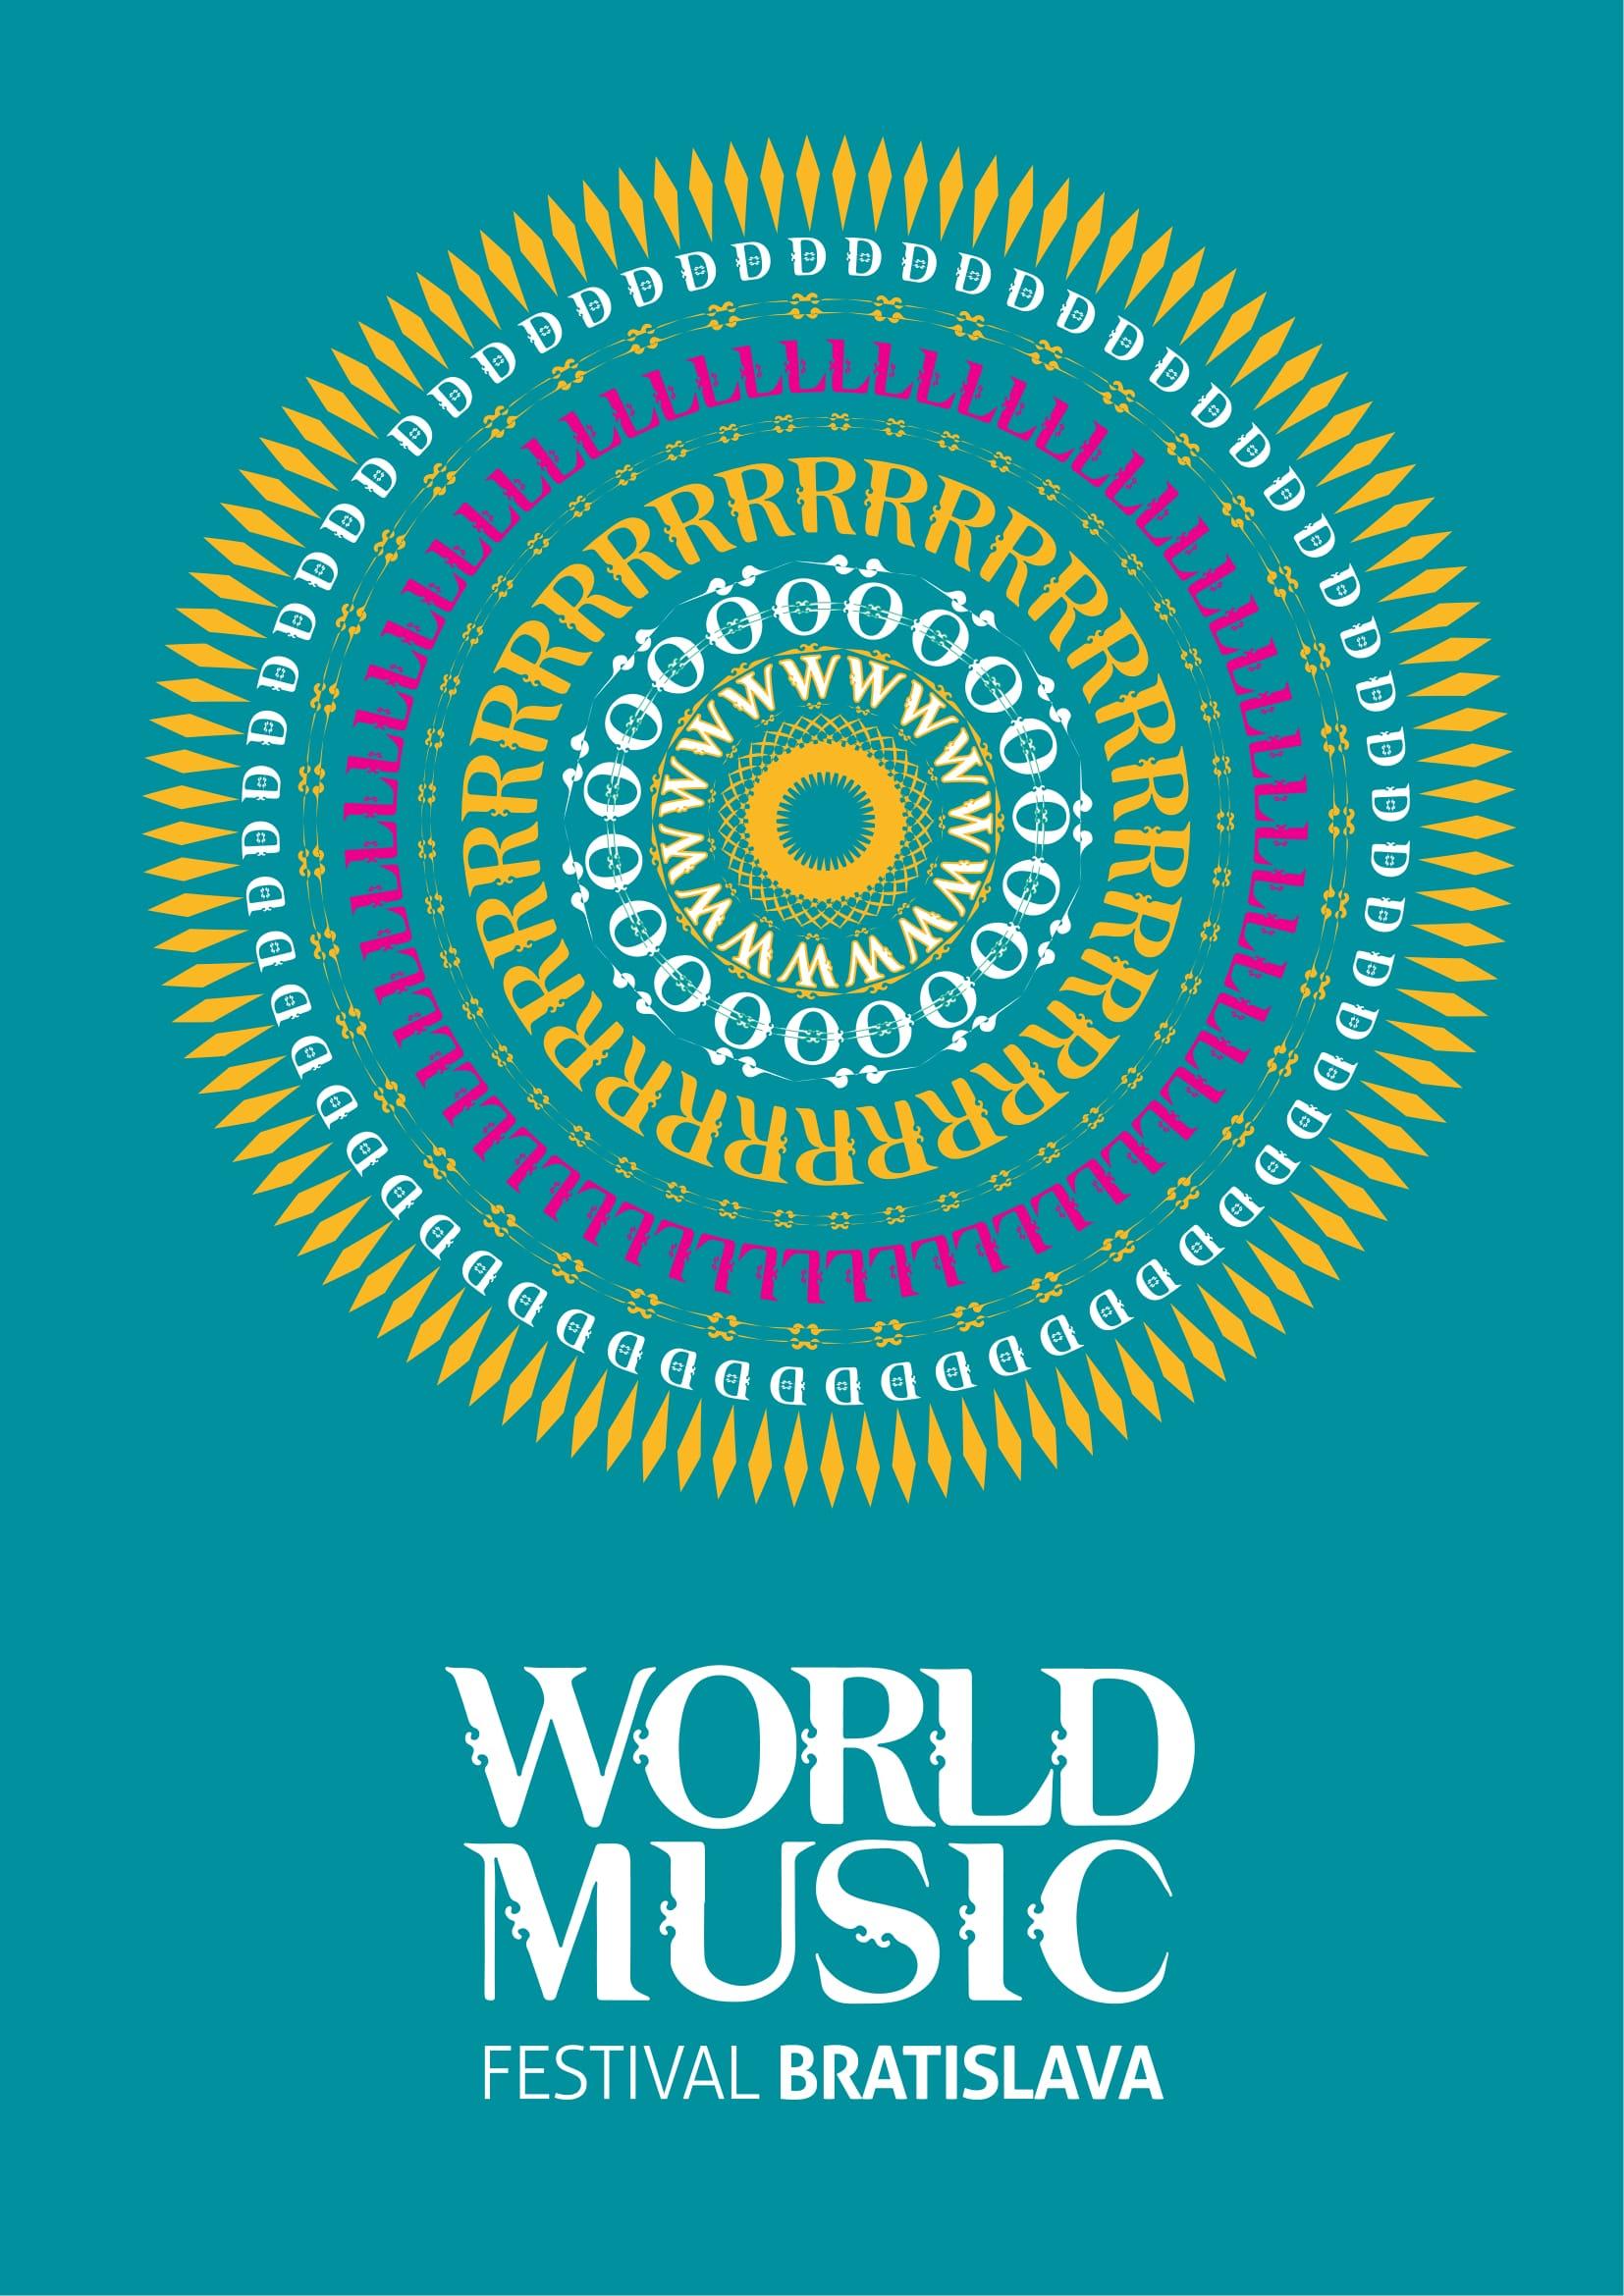 world-music-festival-bratislava-vizual.jpg